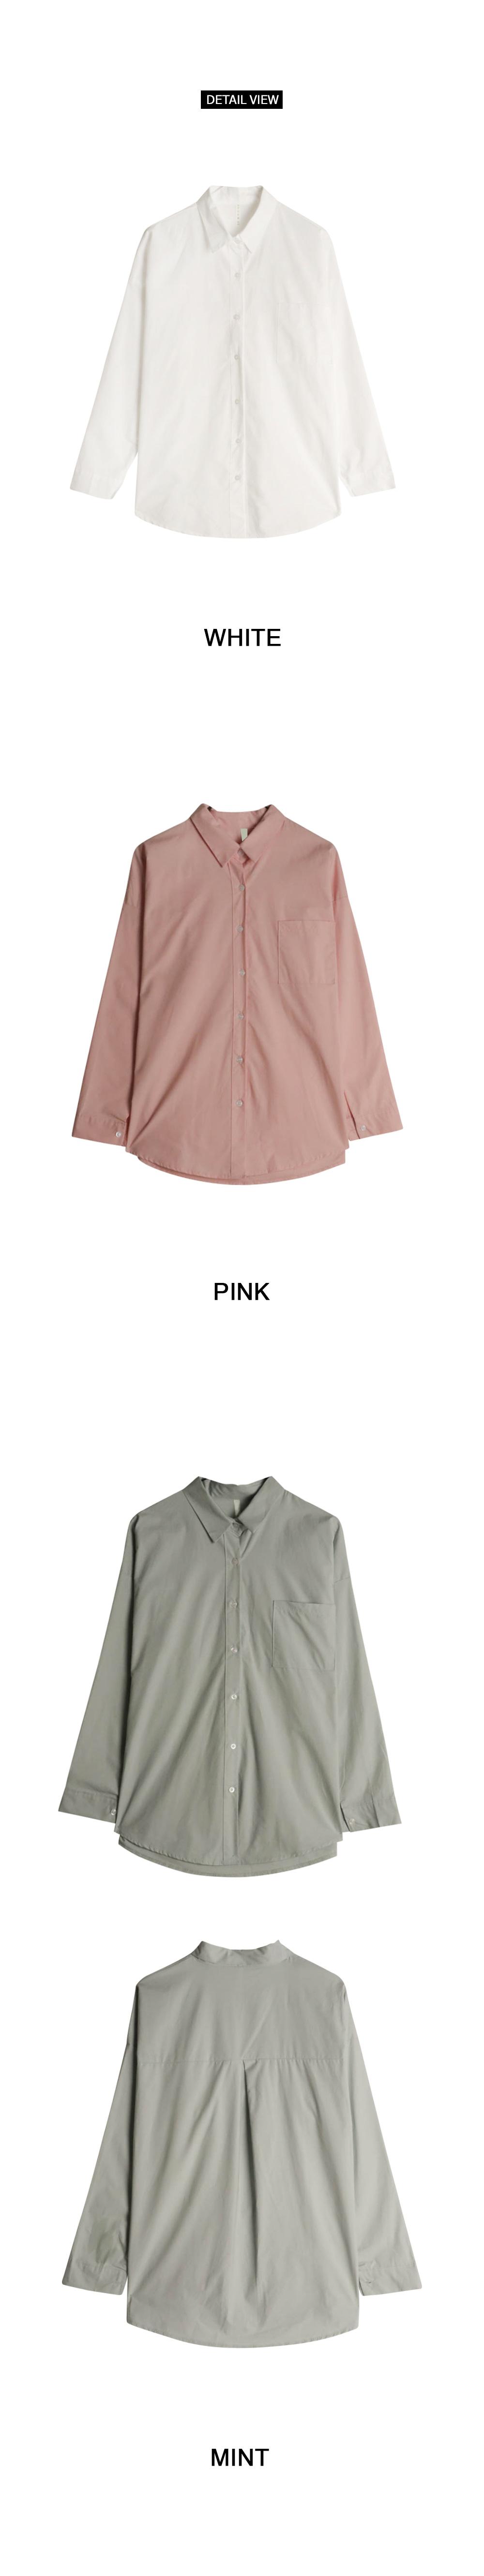 Course over cotton shirt